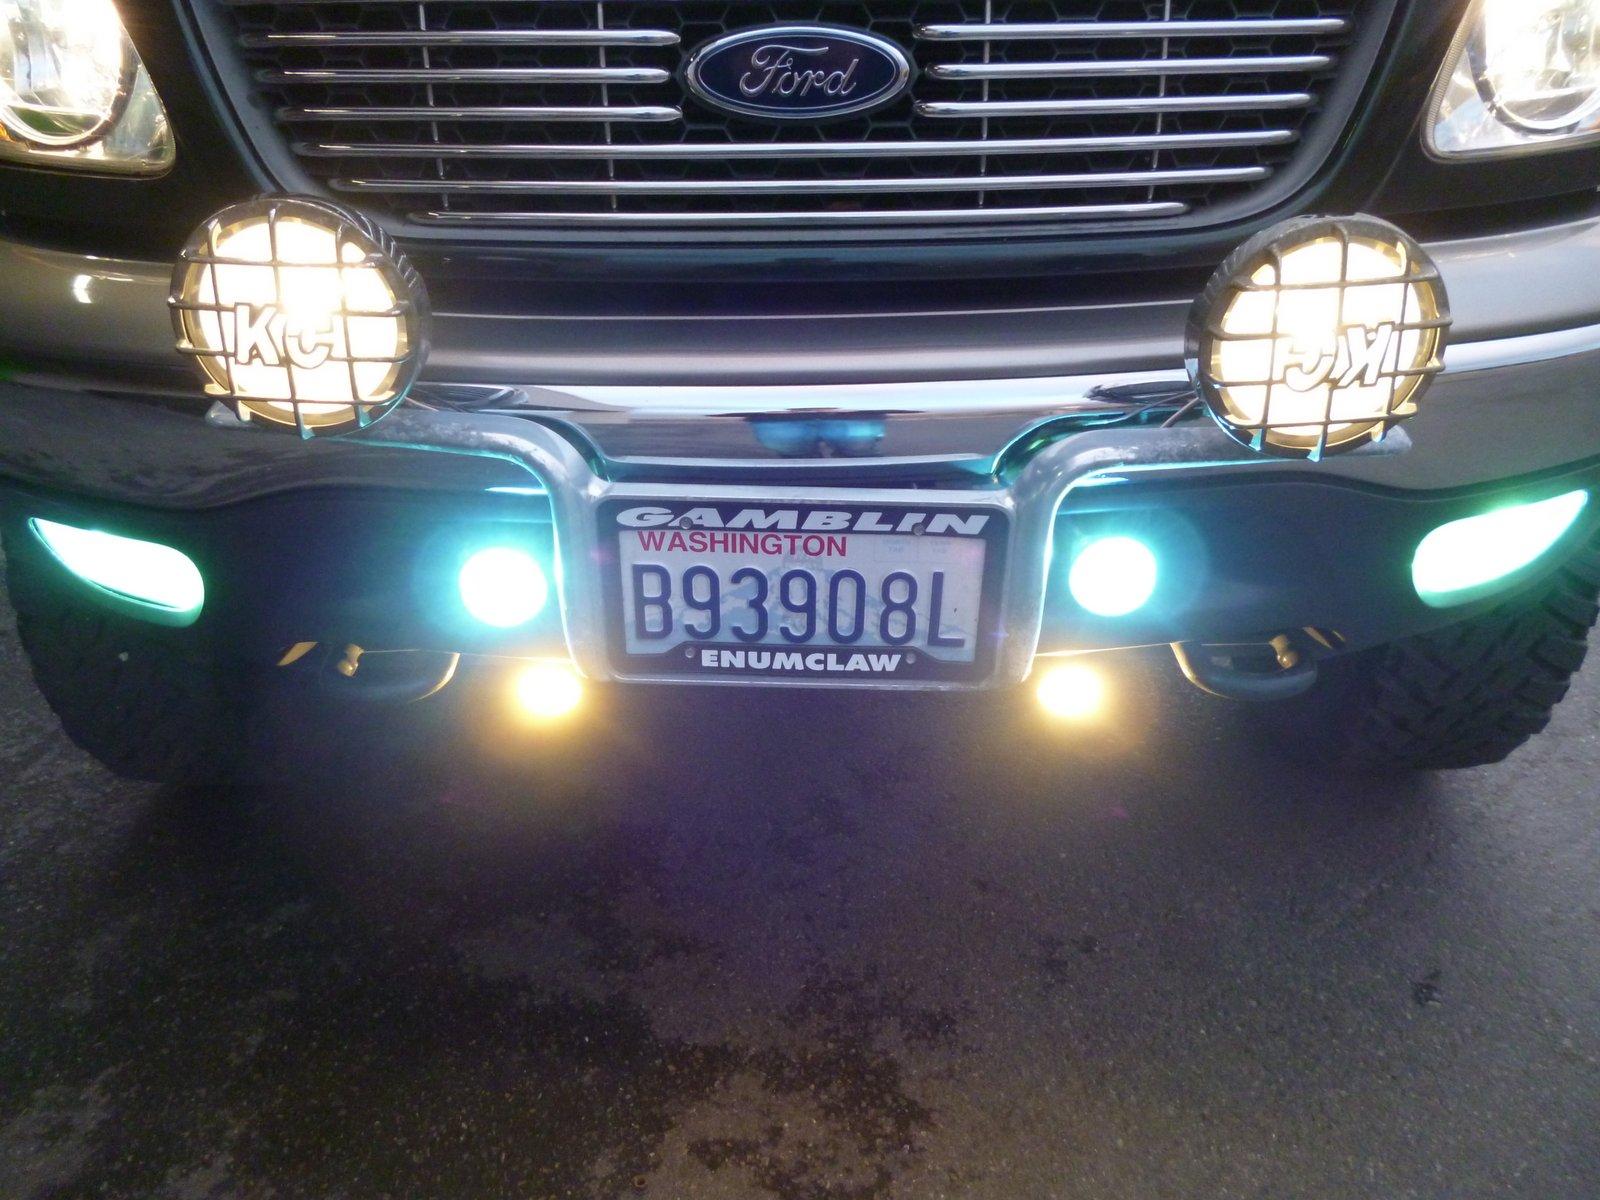 Gamblin motors 2001 ford f 150 crew cab xlt for General motors dealership near me